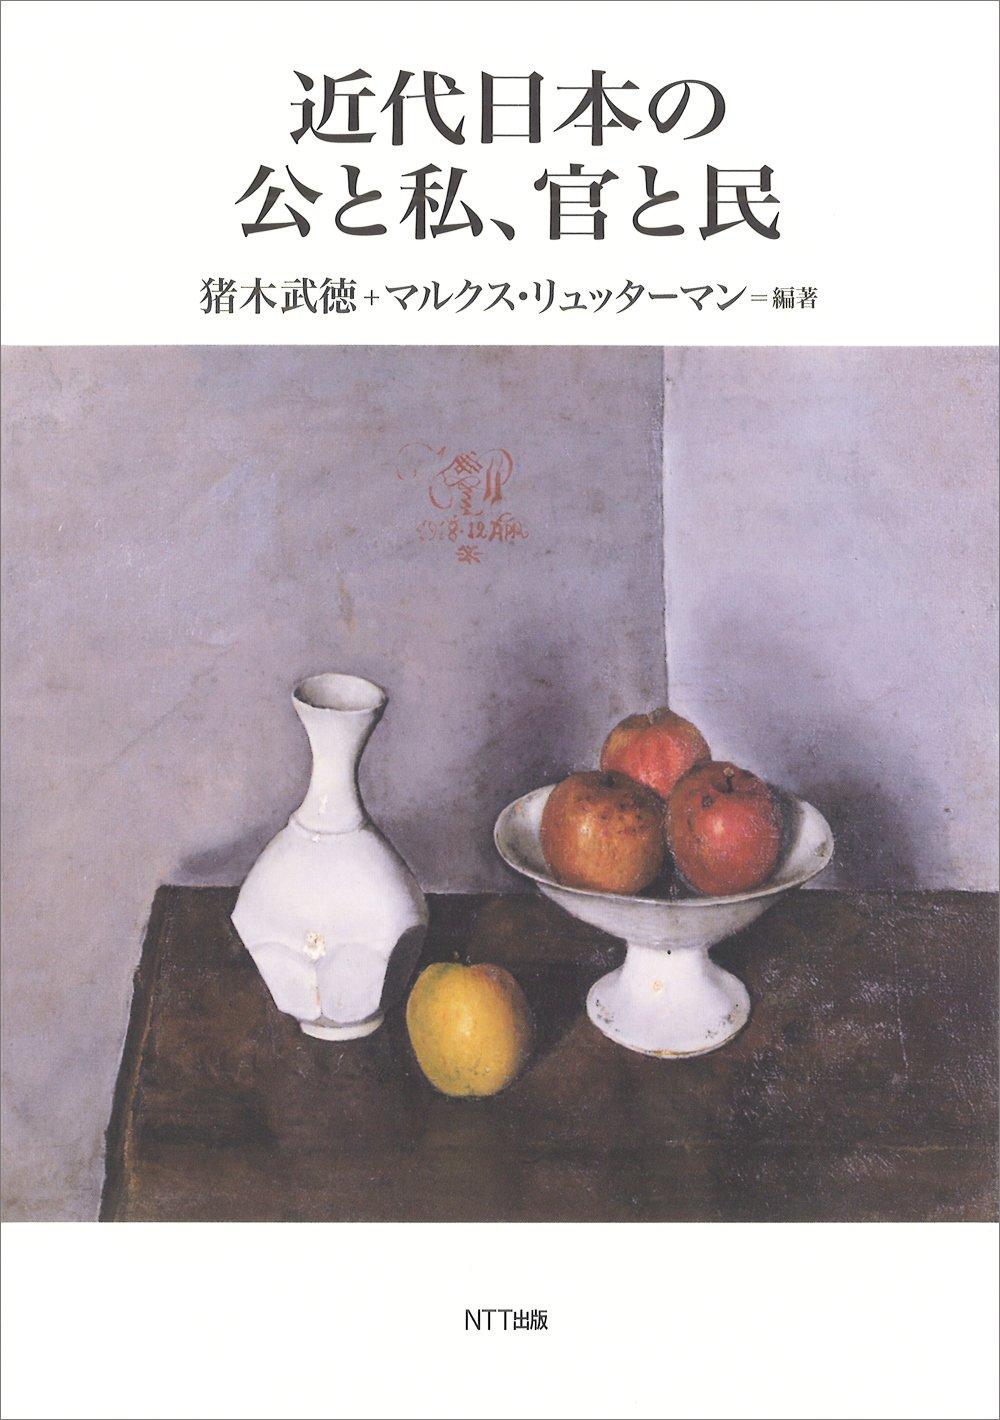 Kindai nihon no kō to shi,kan to min PDF Text fb2 book